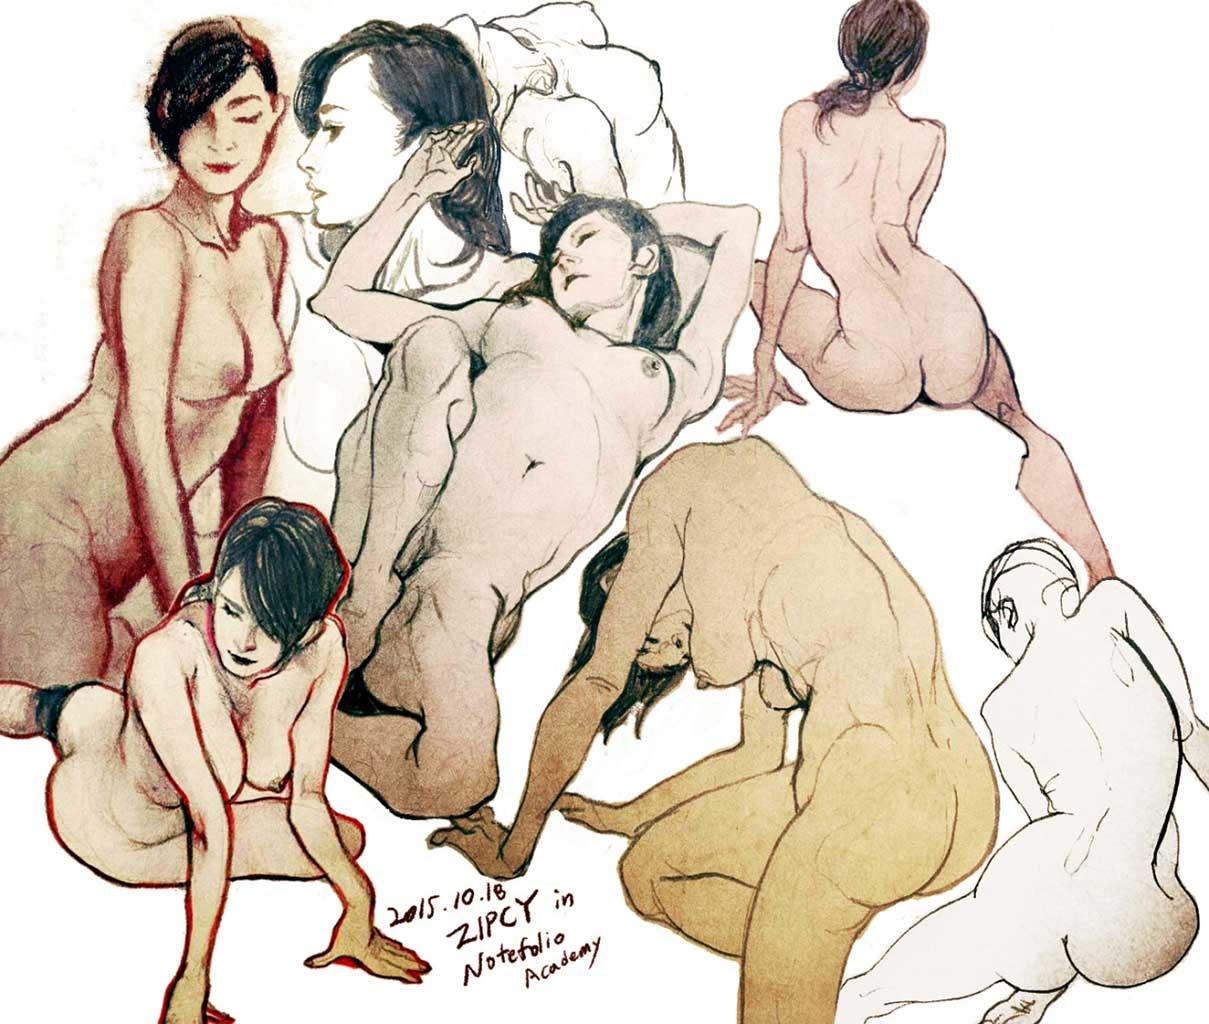 Zipcy, Ян Сэ Ын (Yang Se Eun), Erotic Picture — 34